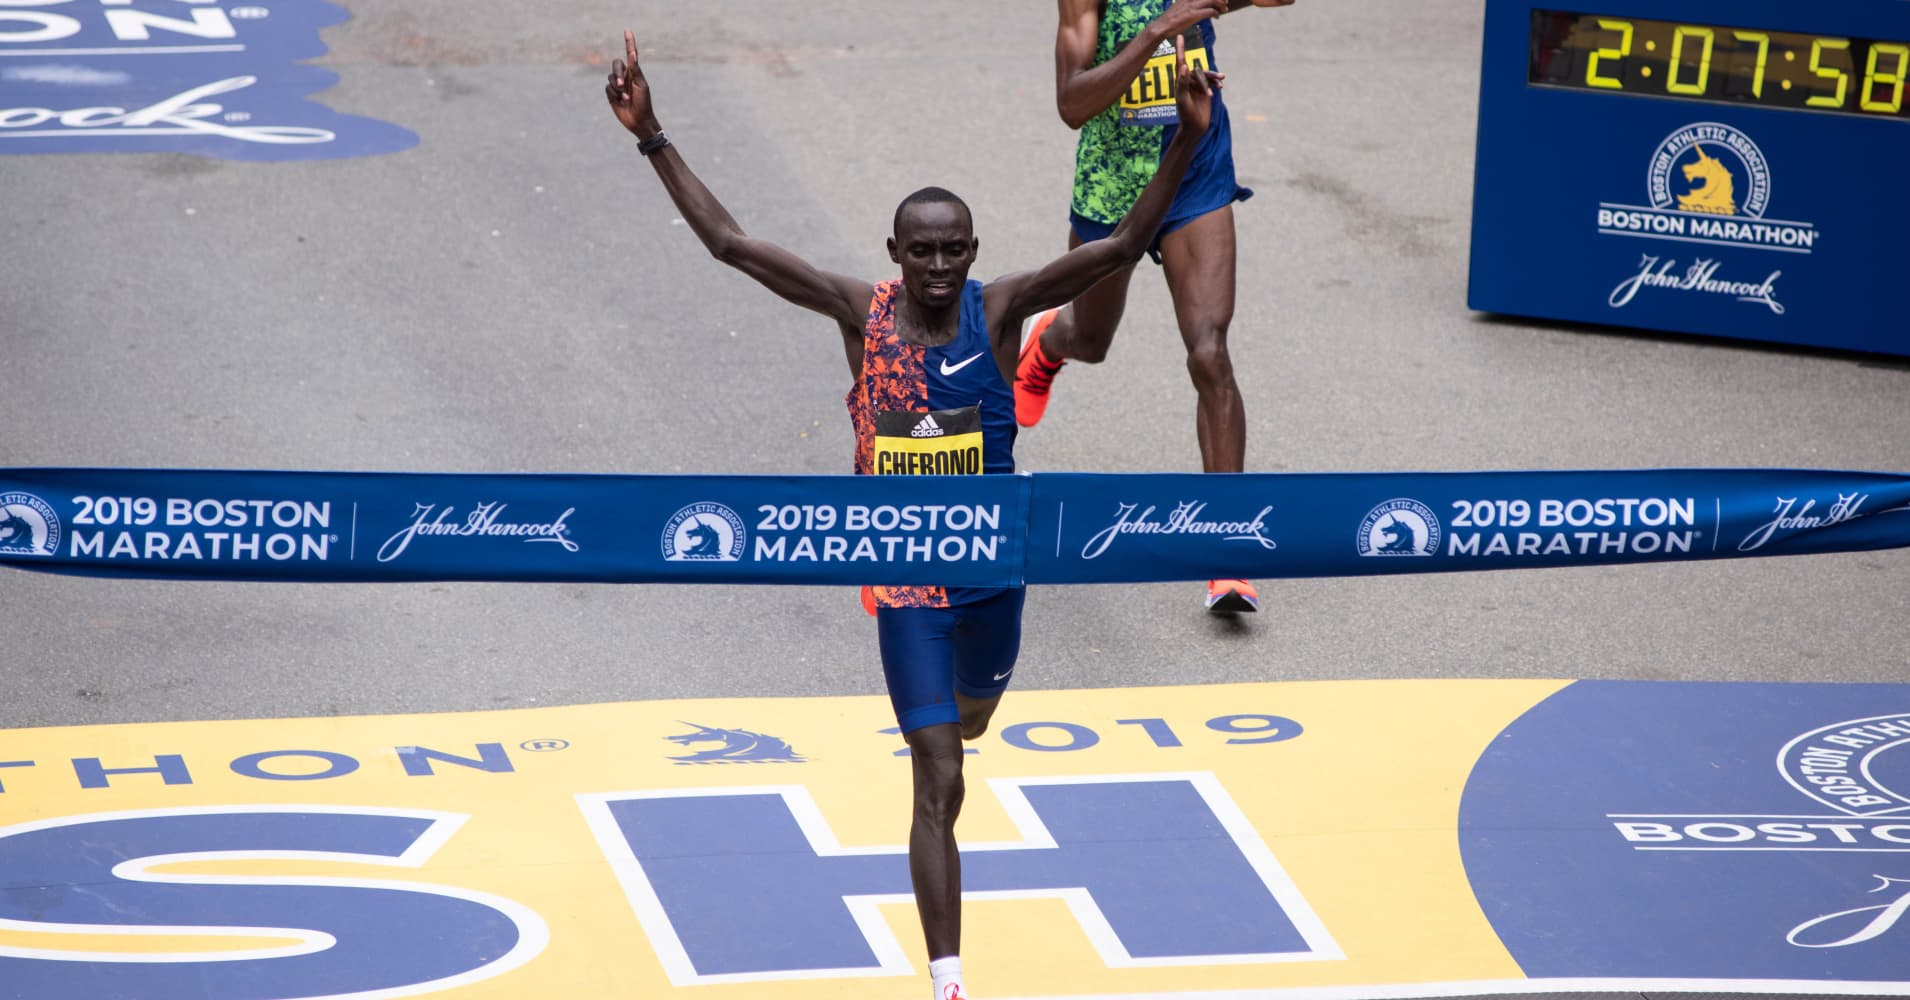 Kenyan Lawrence Cherono edges Ethopian Lelisa Desisa for first place for the Men's Elite race, at the 123rd Boston Marathon on April 15, 2019